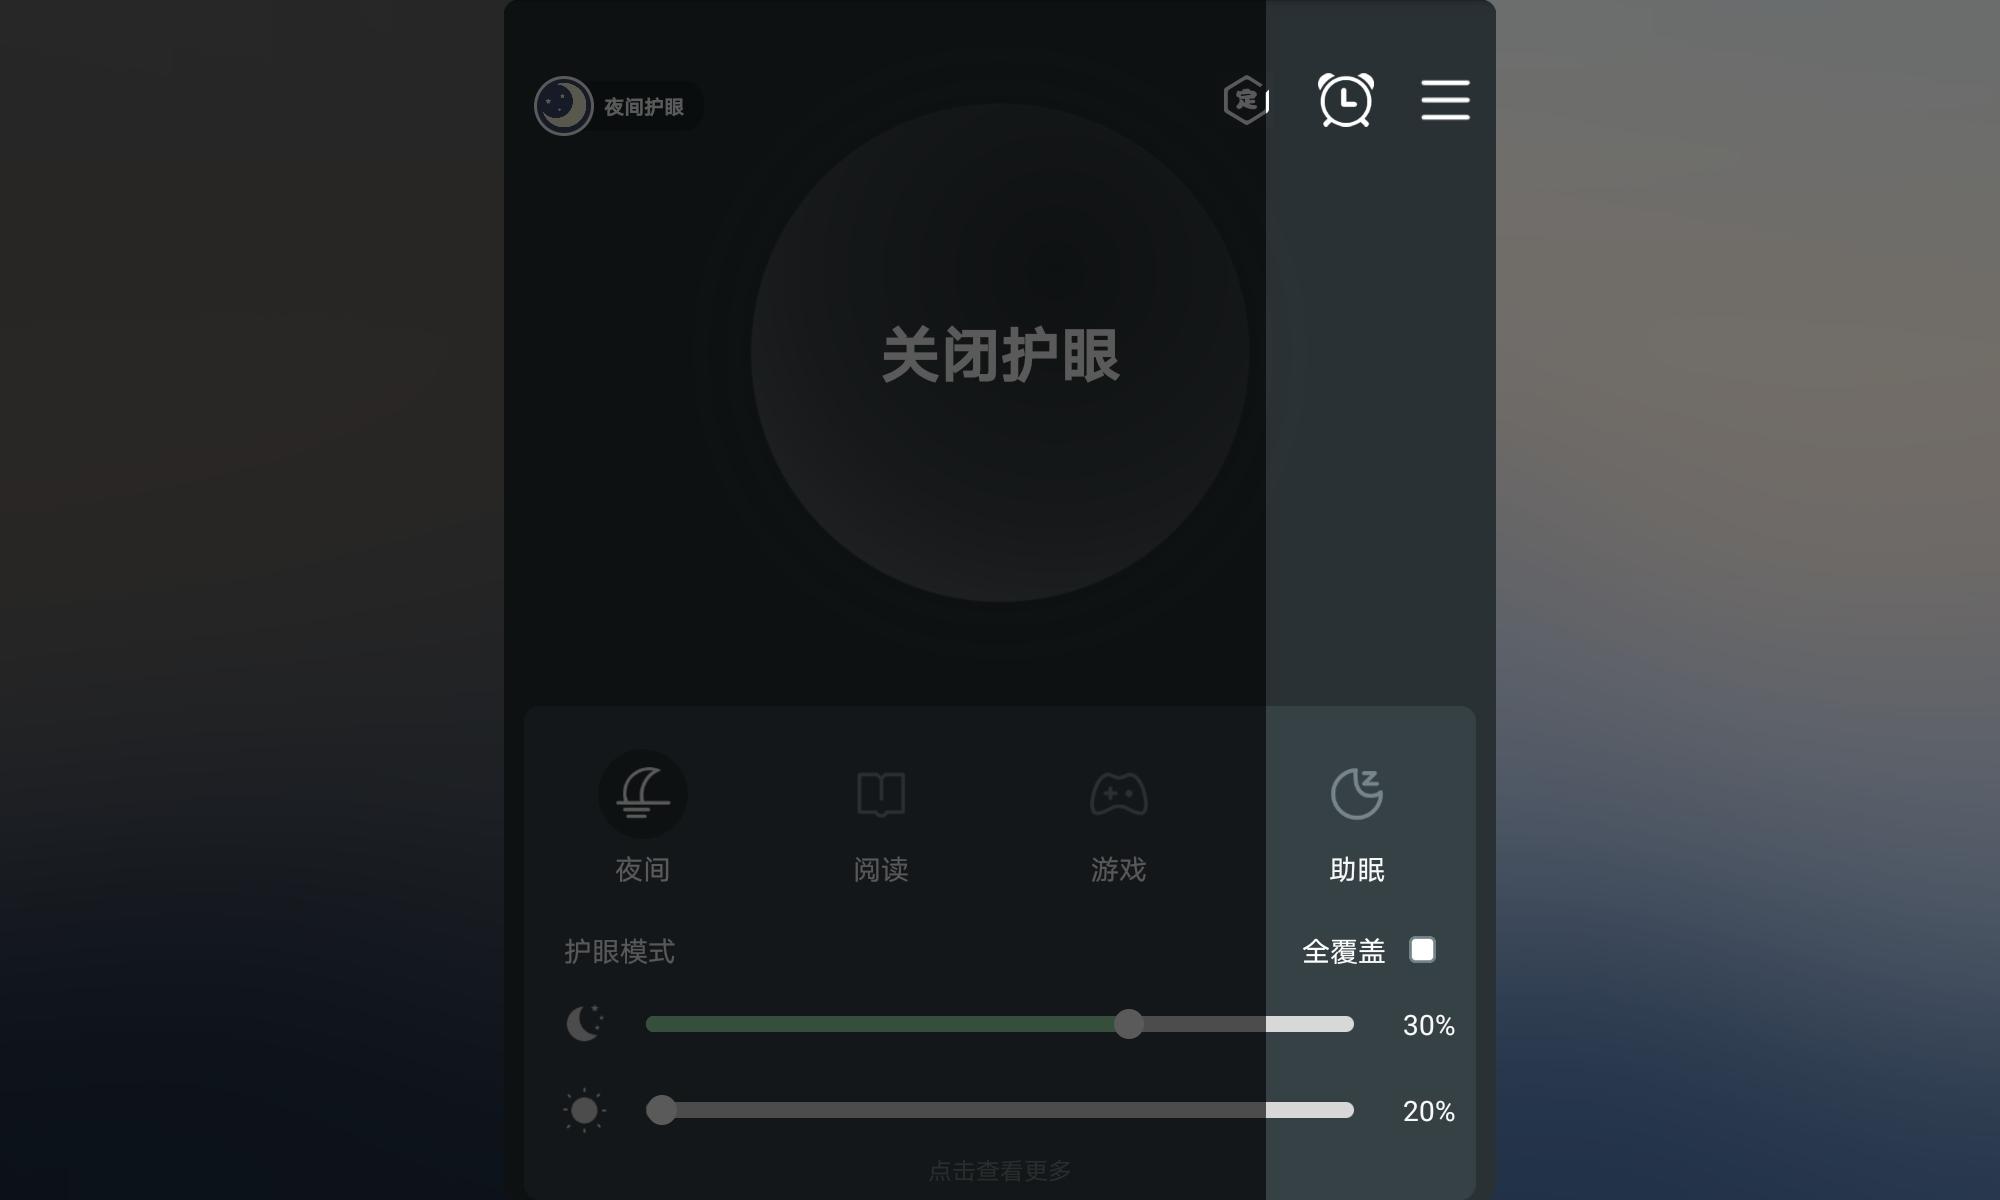 Screenshot_20201021_232408_com.chenai.ieyes.jpg